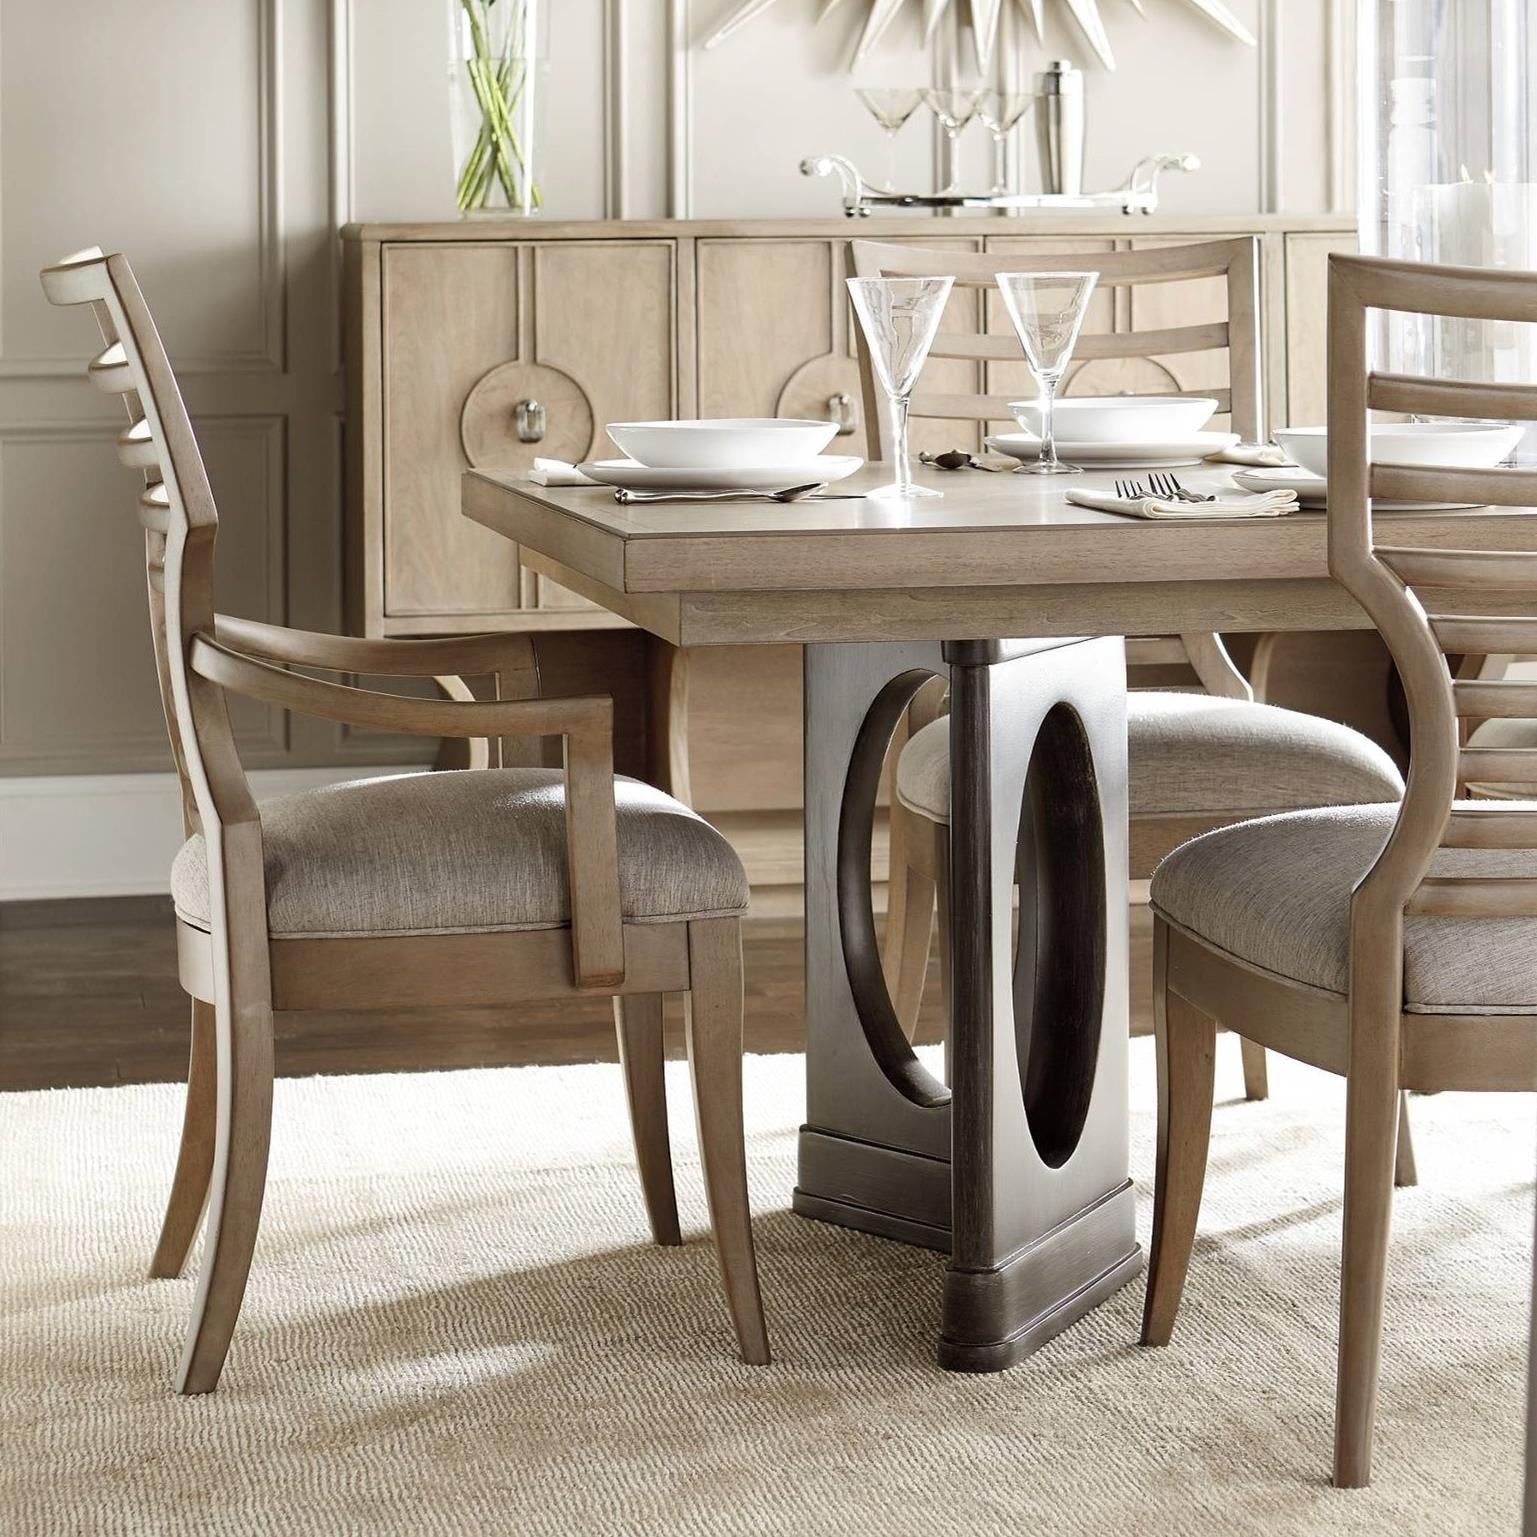 Stanley Dining Room Sets: Stanley Furniture Virage 9-Piece Double Pedestal Dining